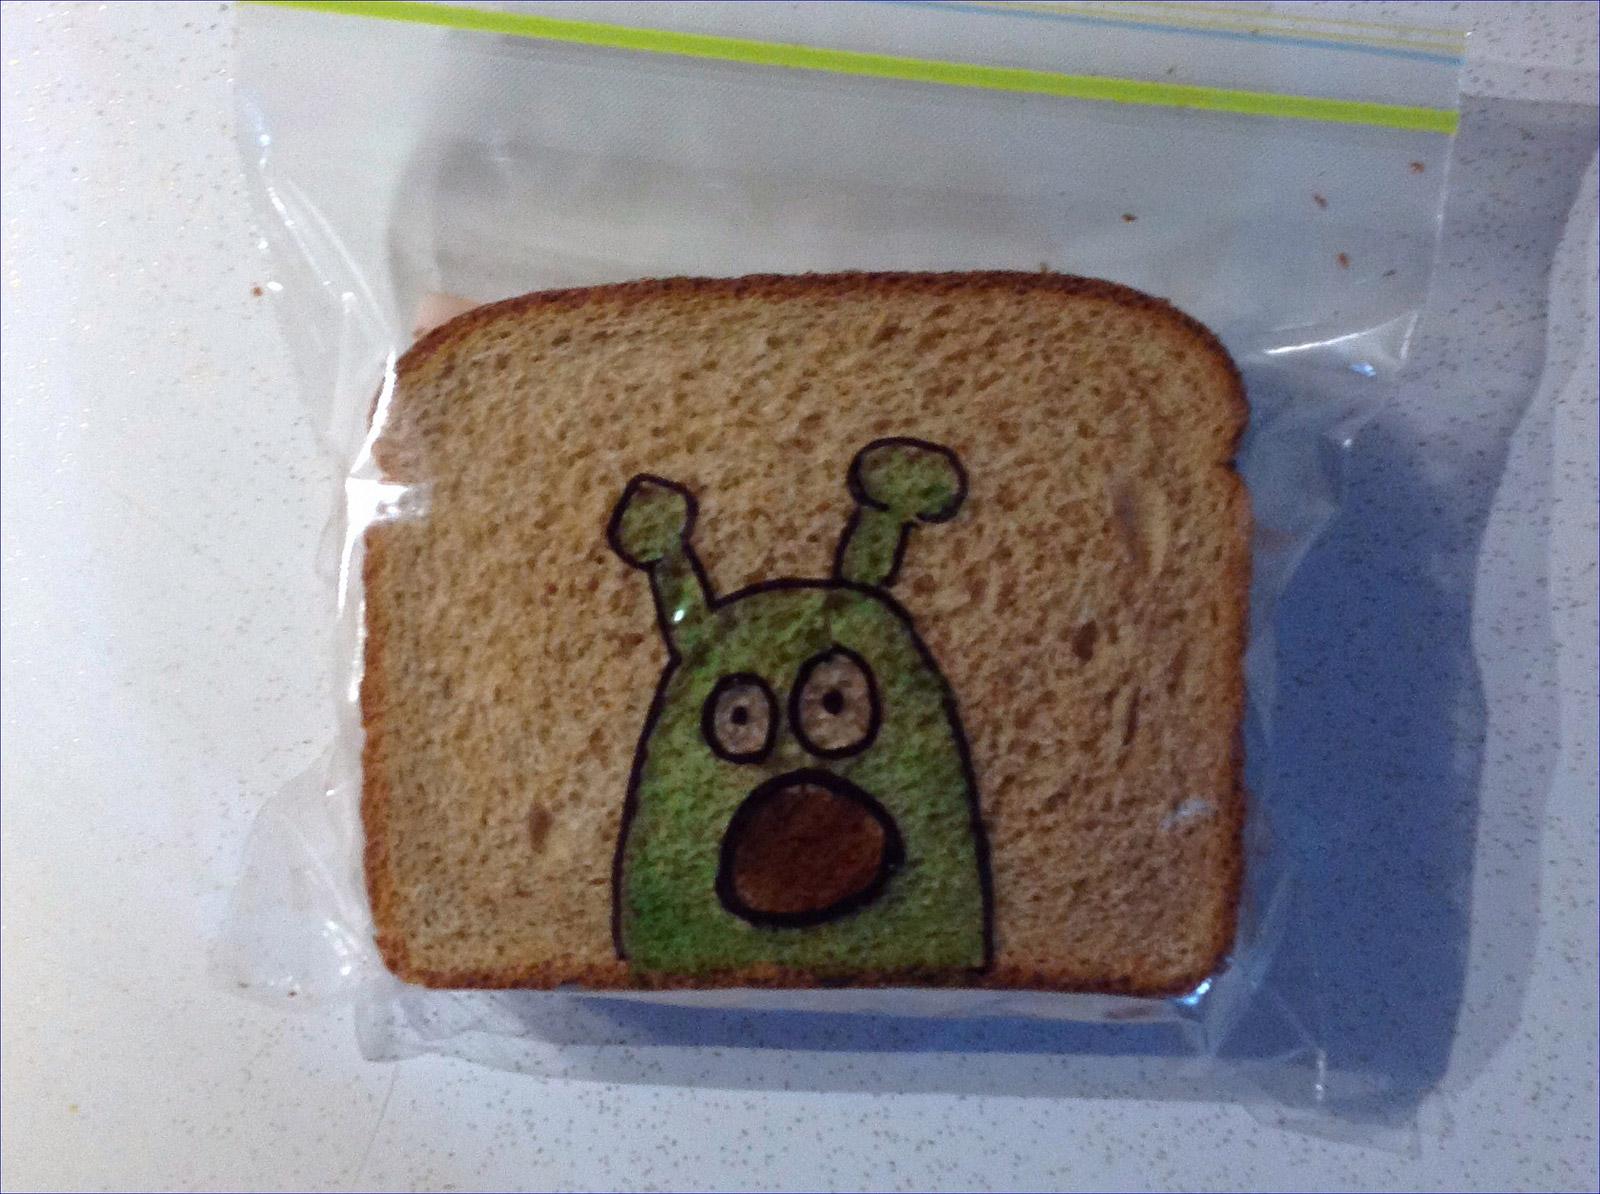 david-laferriere-creative-lunch-bag-illustration-30